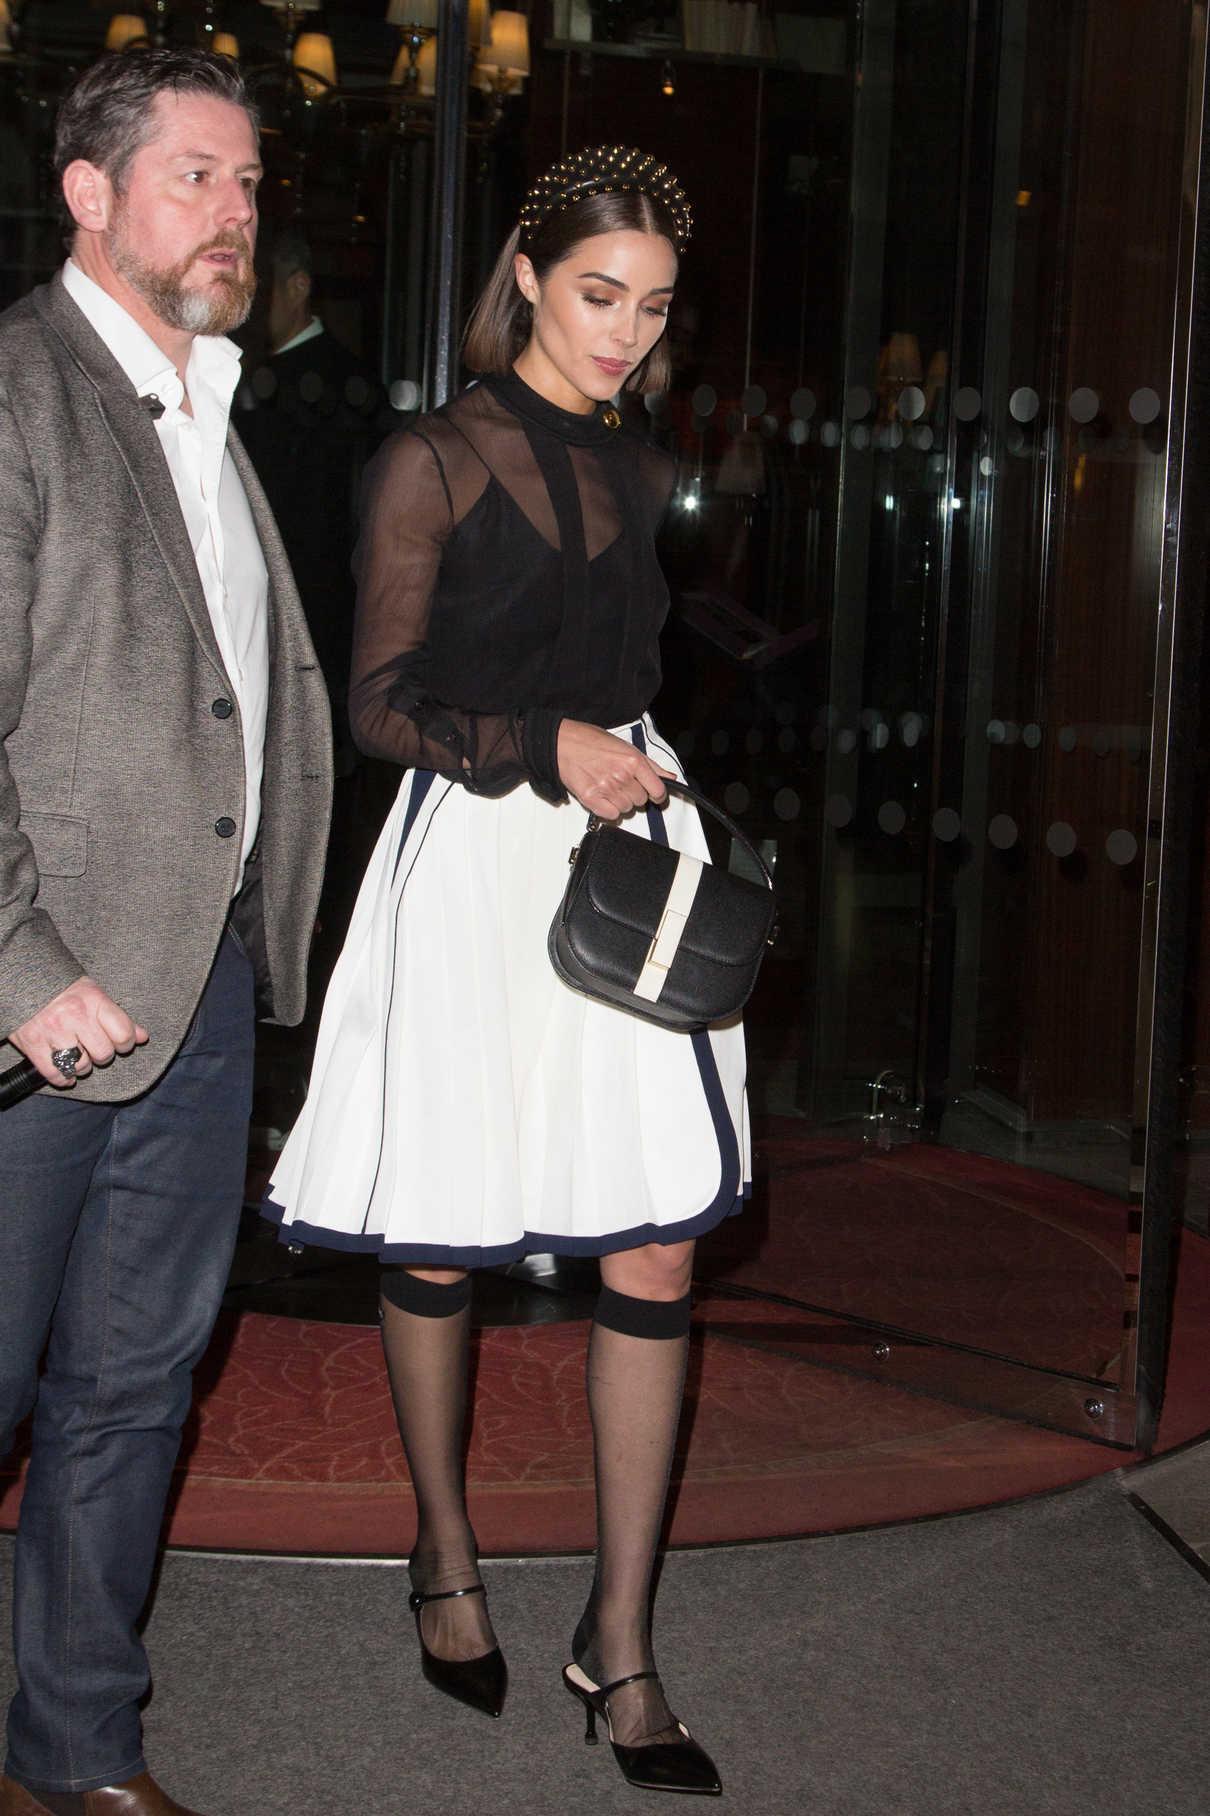 Olivia Culpo in a White Skirt